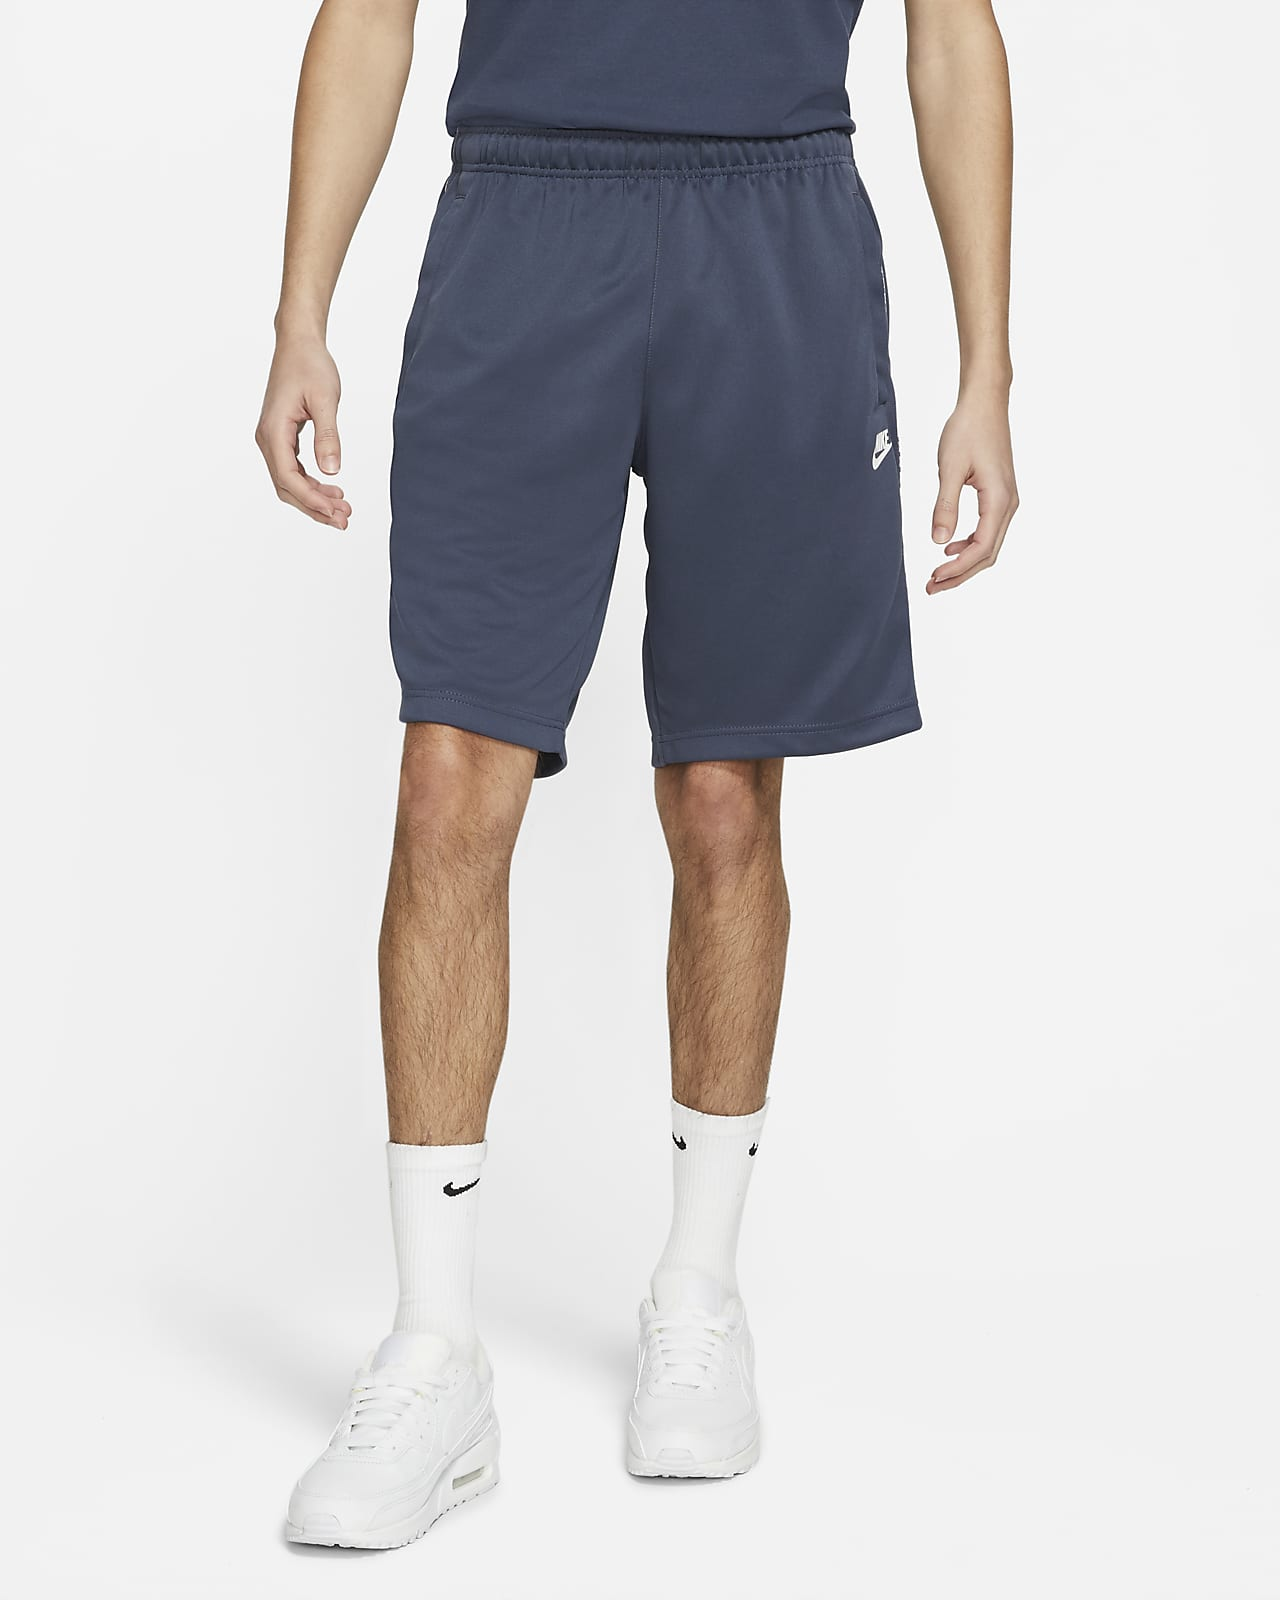 Nike Sportswear Polyknit-Shorts für Herren